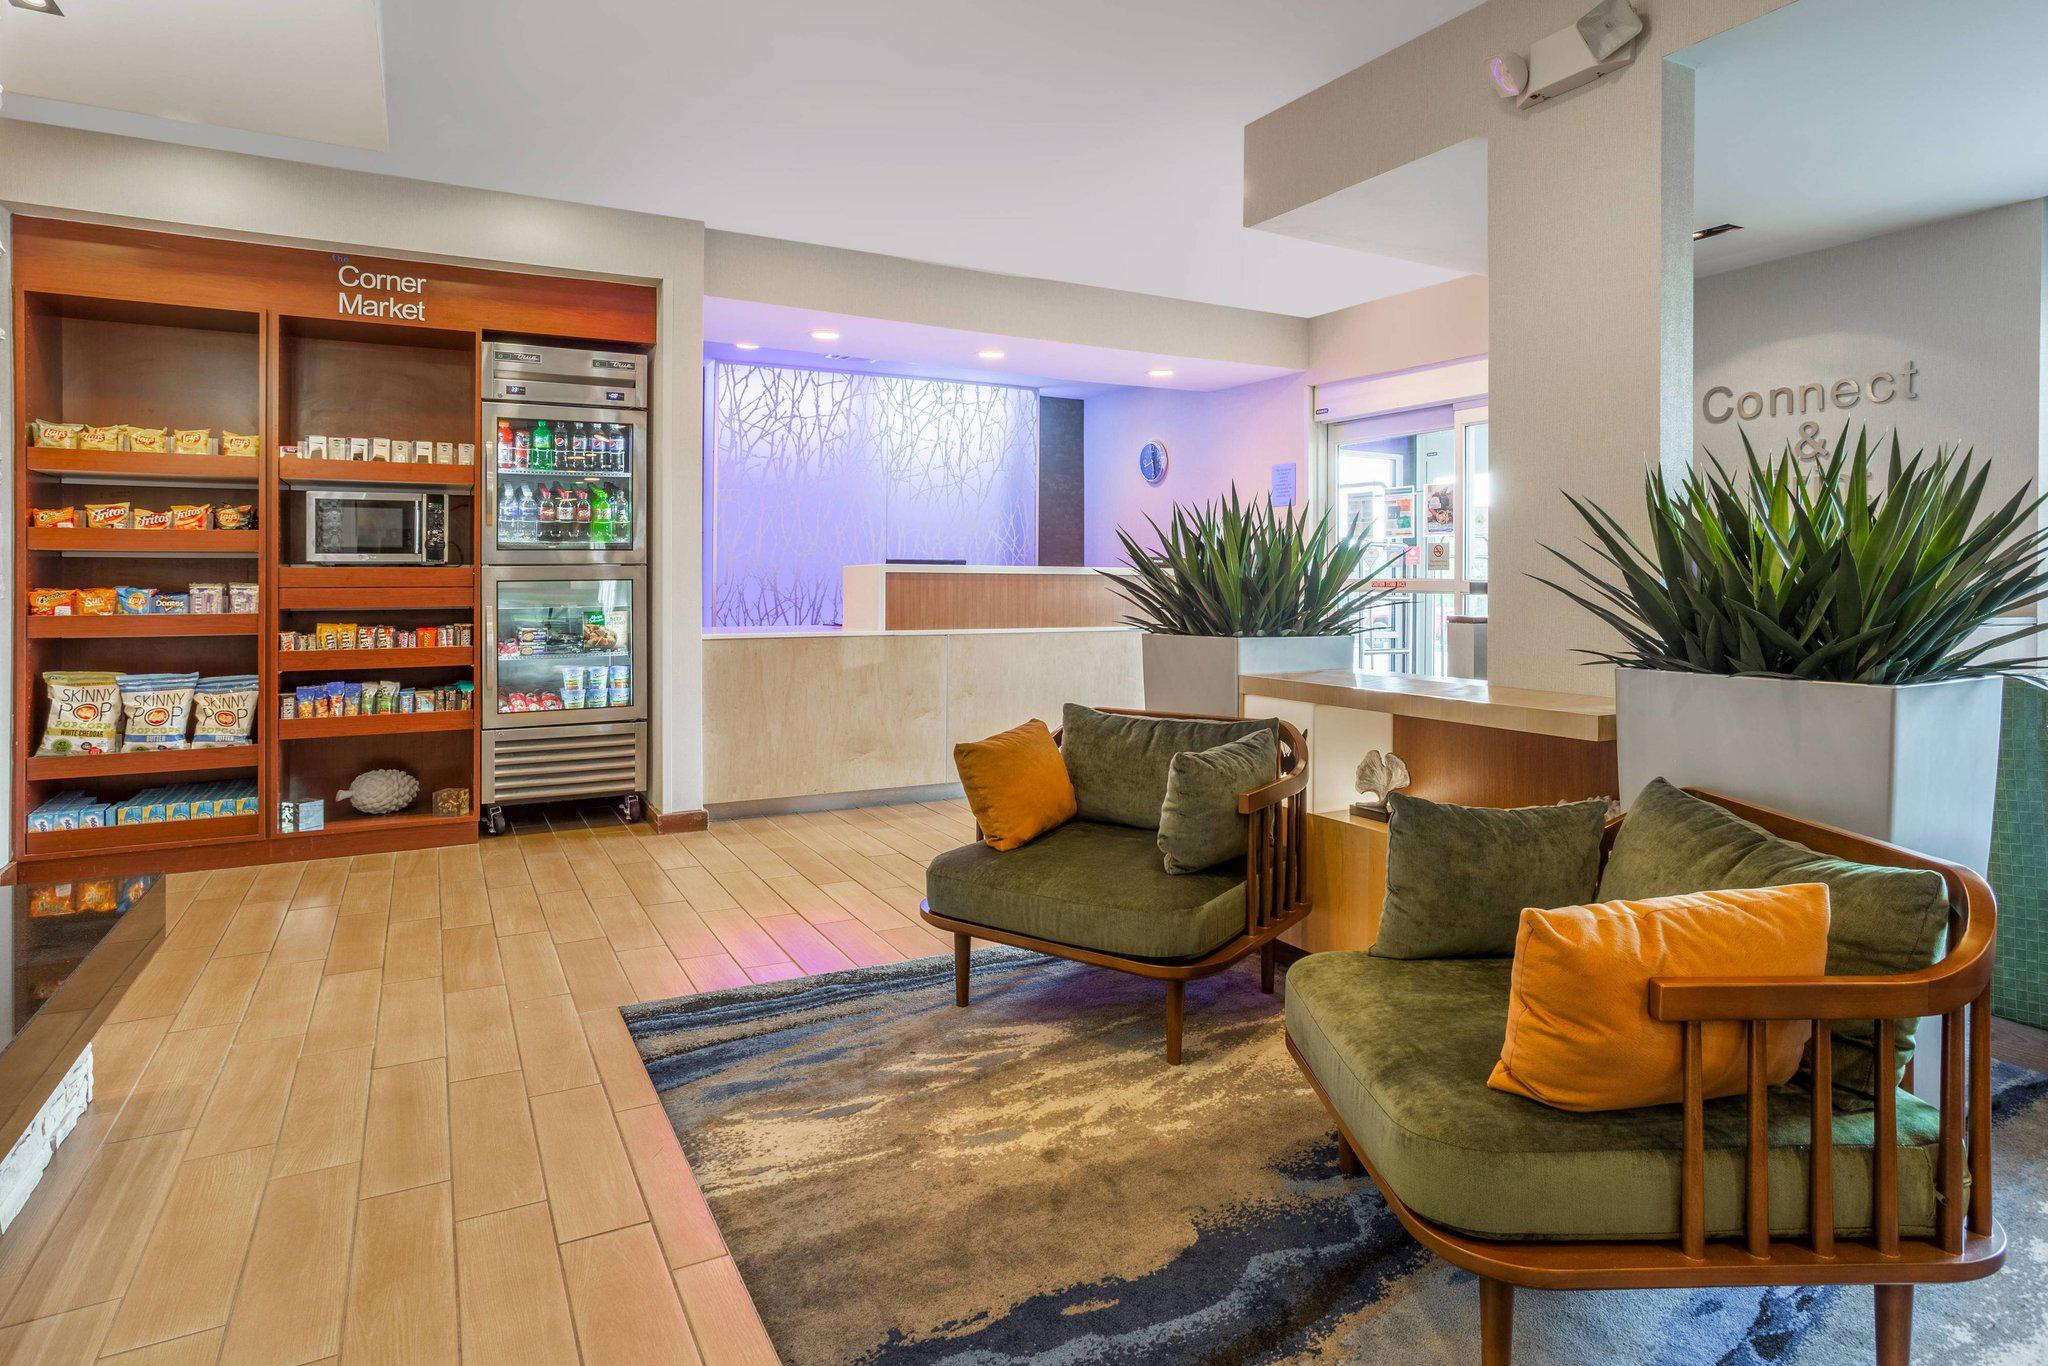 Fairfield Inn & Suites by Marriott Indianapolis Northwest